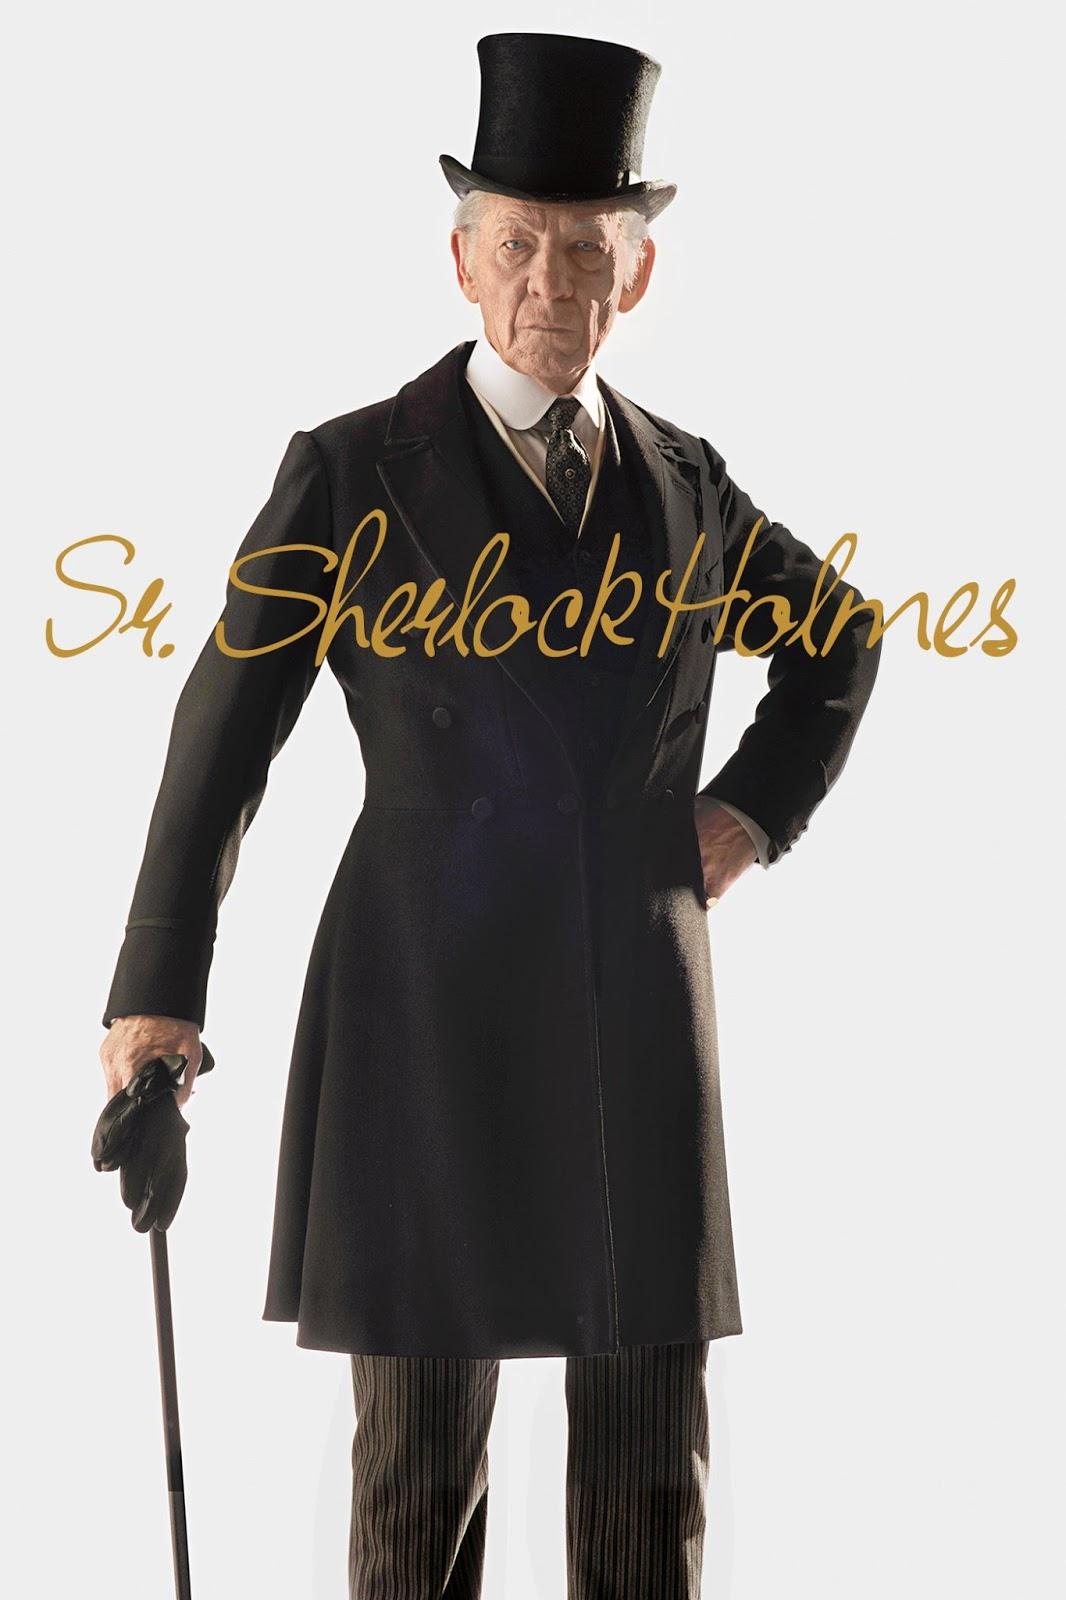 Sr. Sherlock Holmes – Dublado (2015)